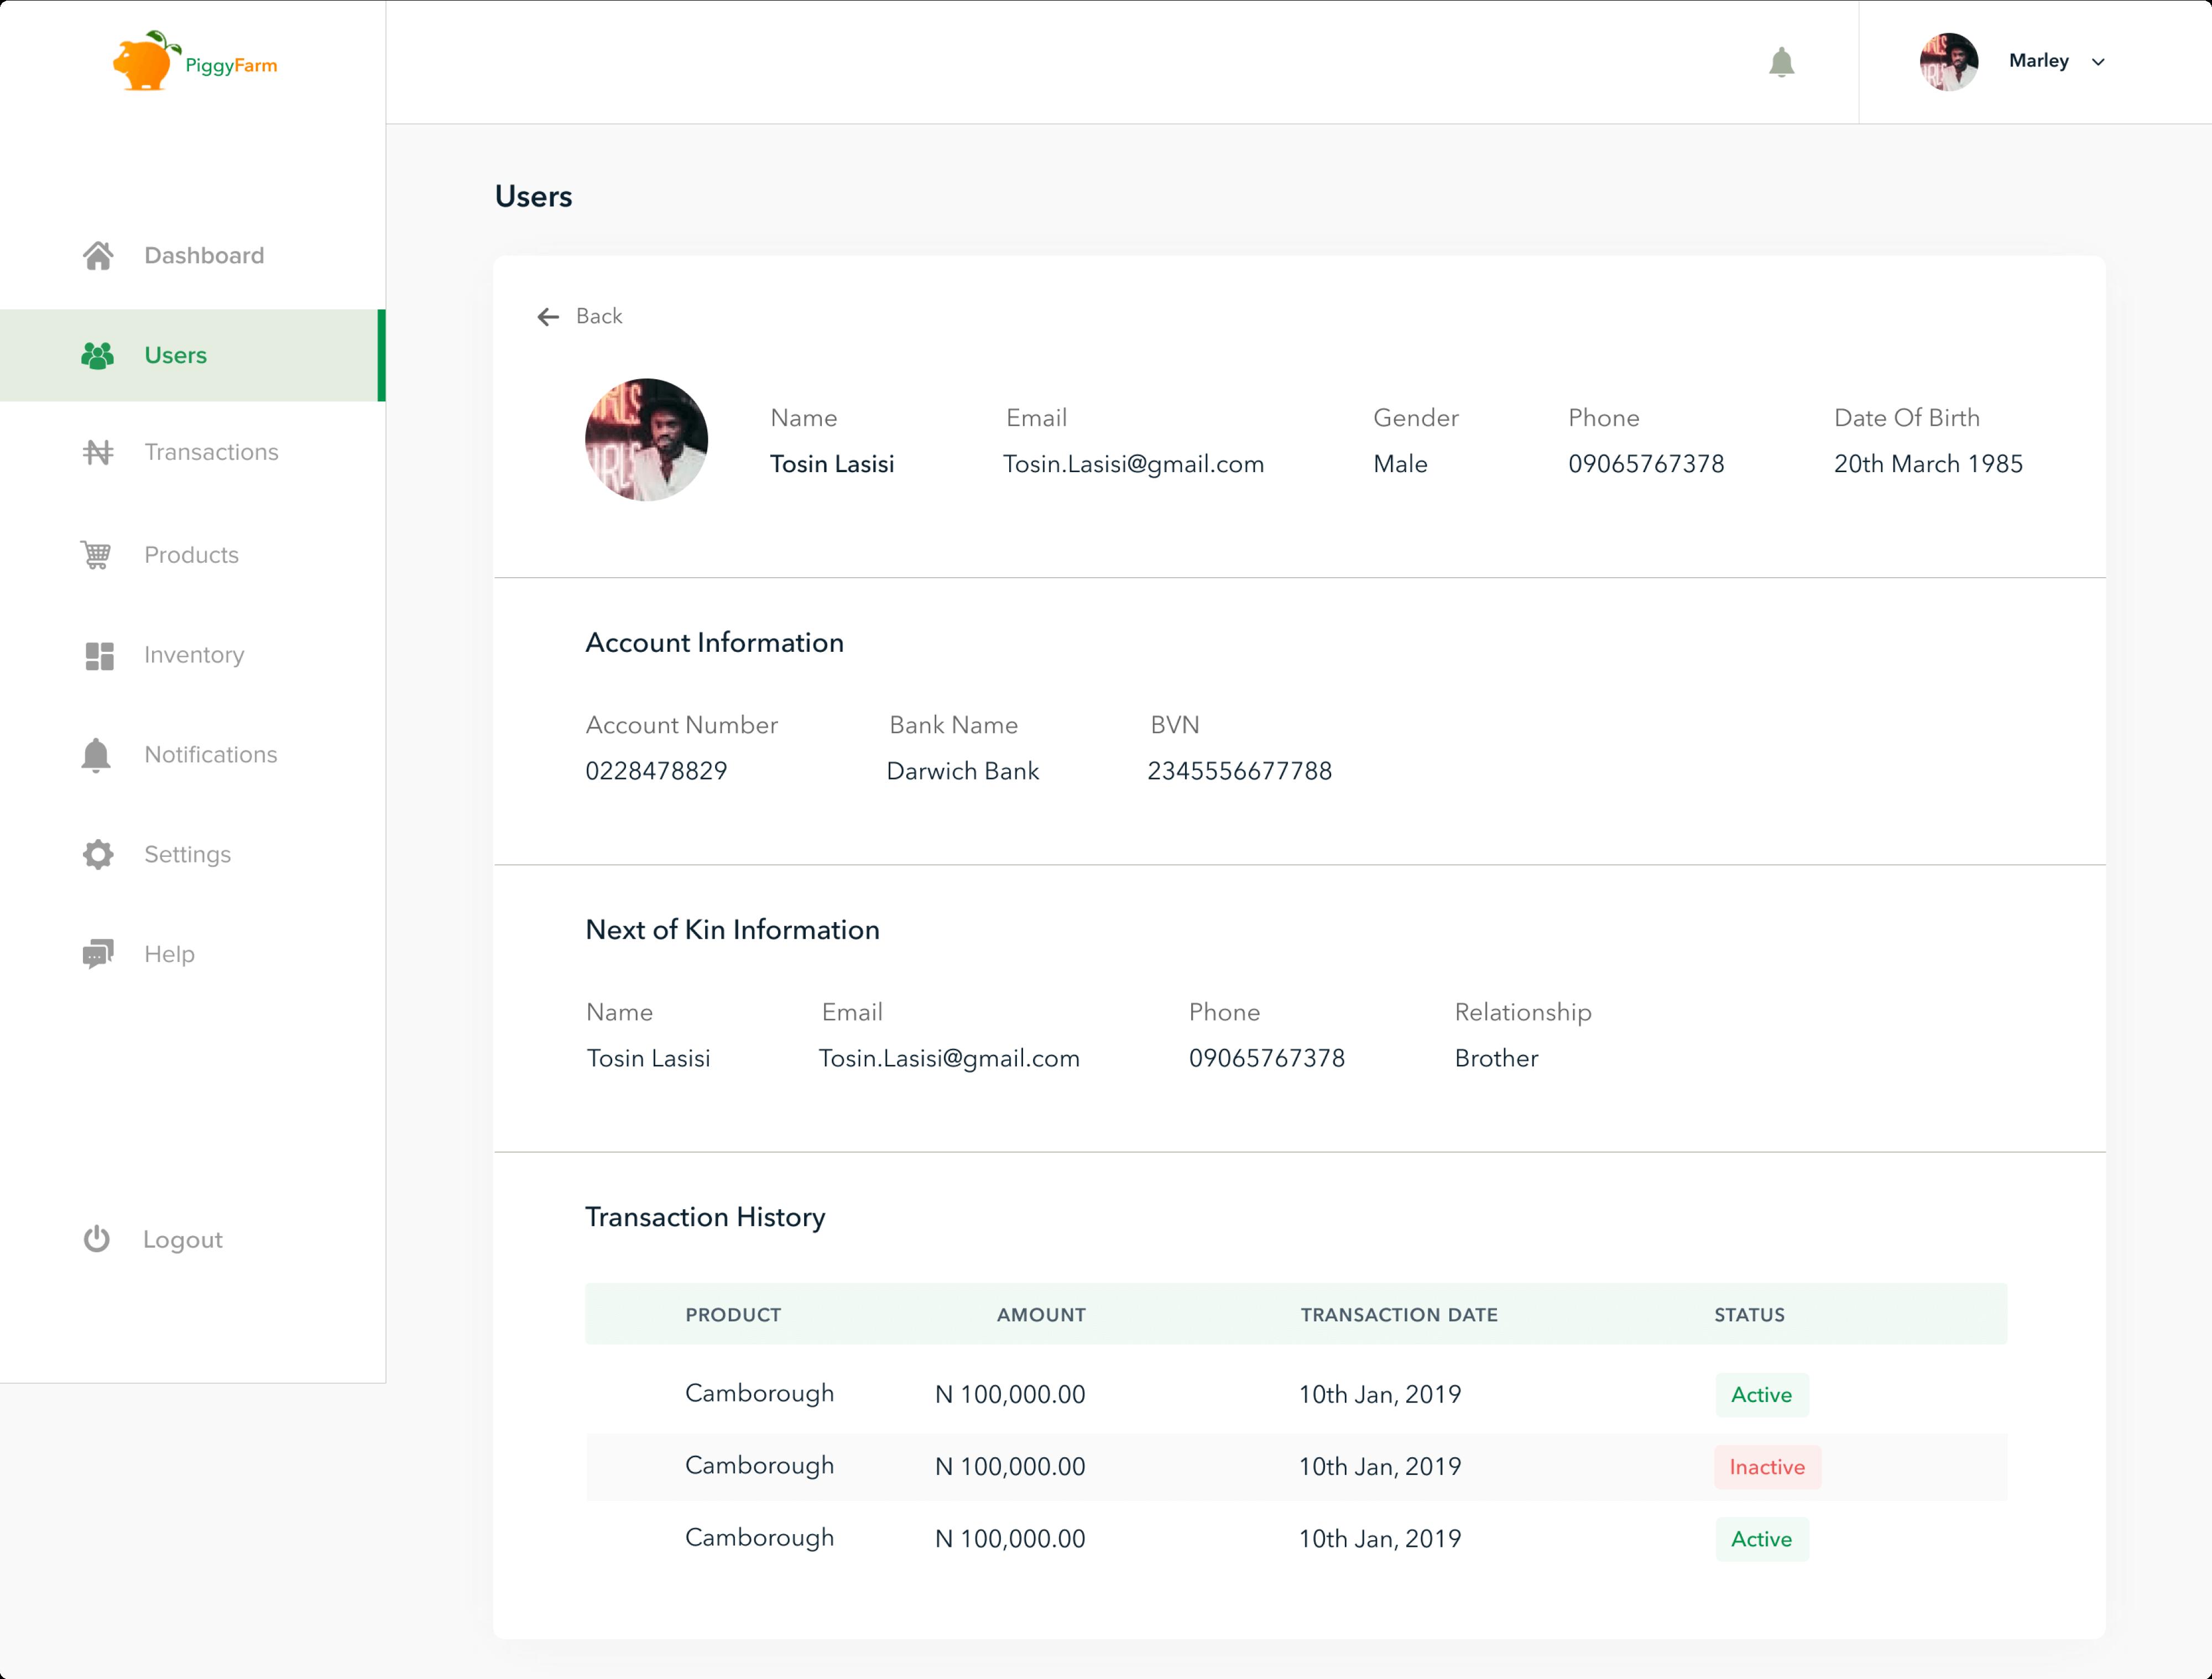 PiggyFarm User Details Page